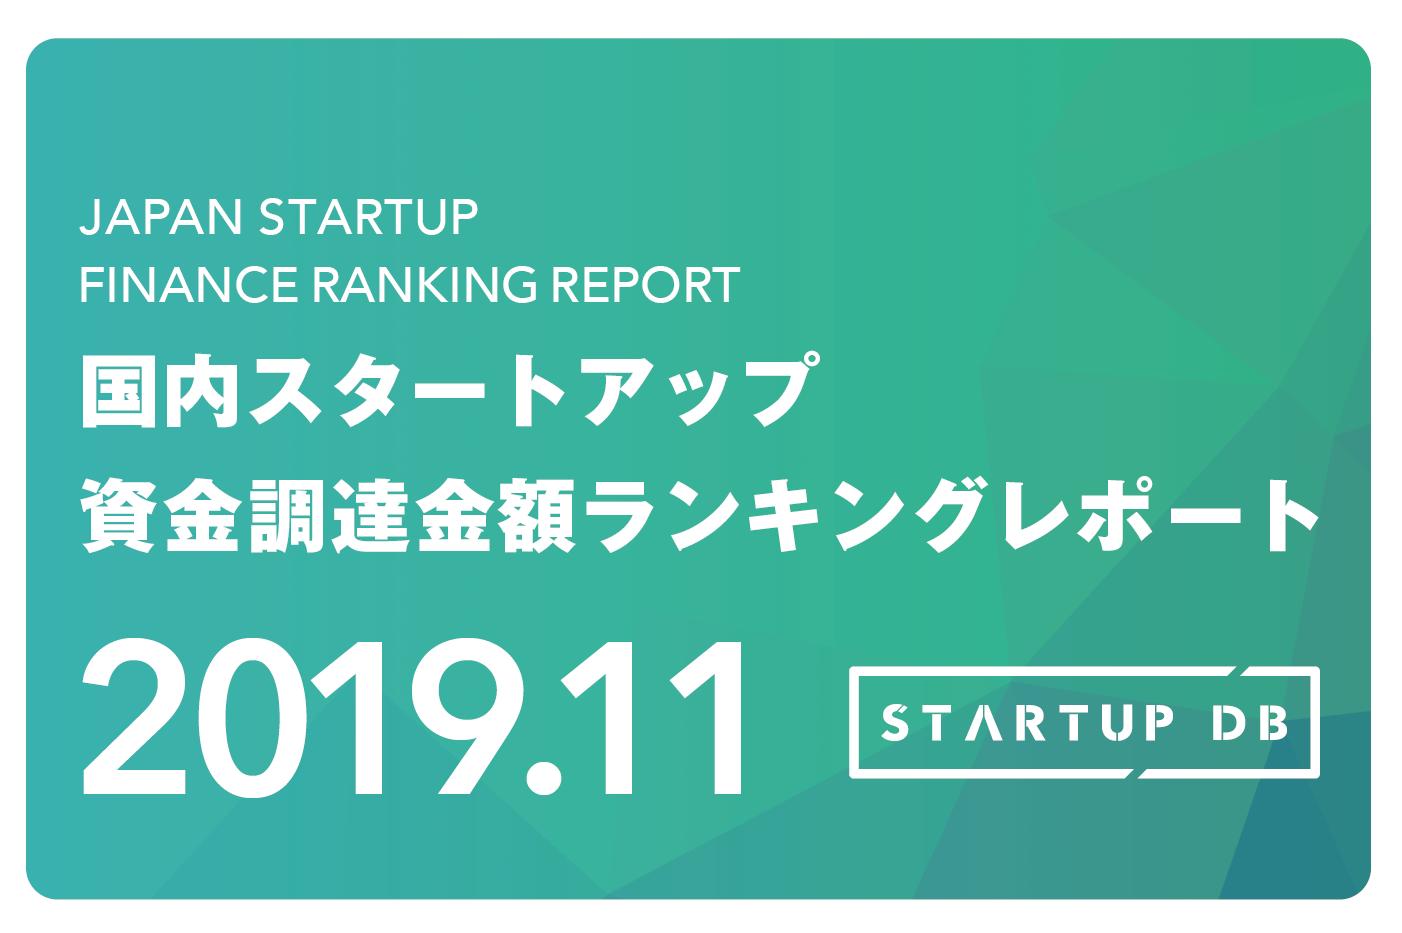 【STARTUP DB】調査結果 国内スタートアップ資金調達ランキング 156億円調達し2位にランクインしたPaidyなど、新規で4社がランクイン